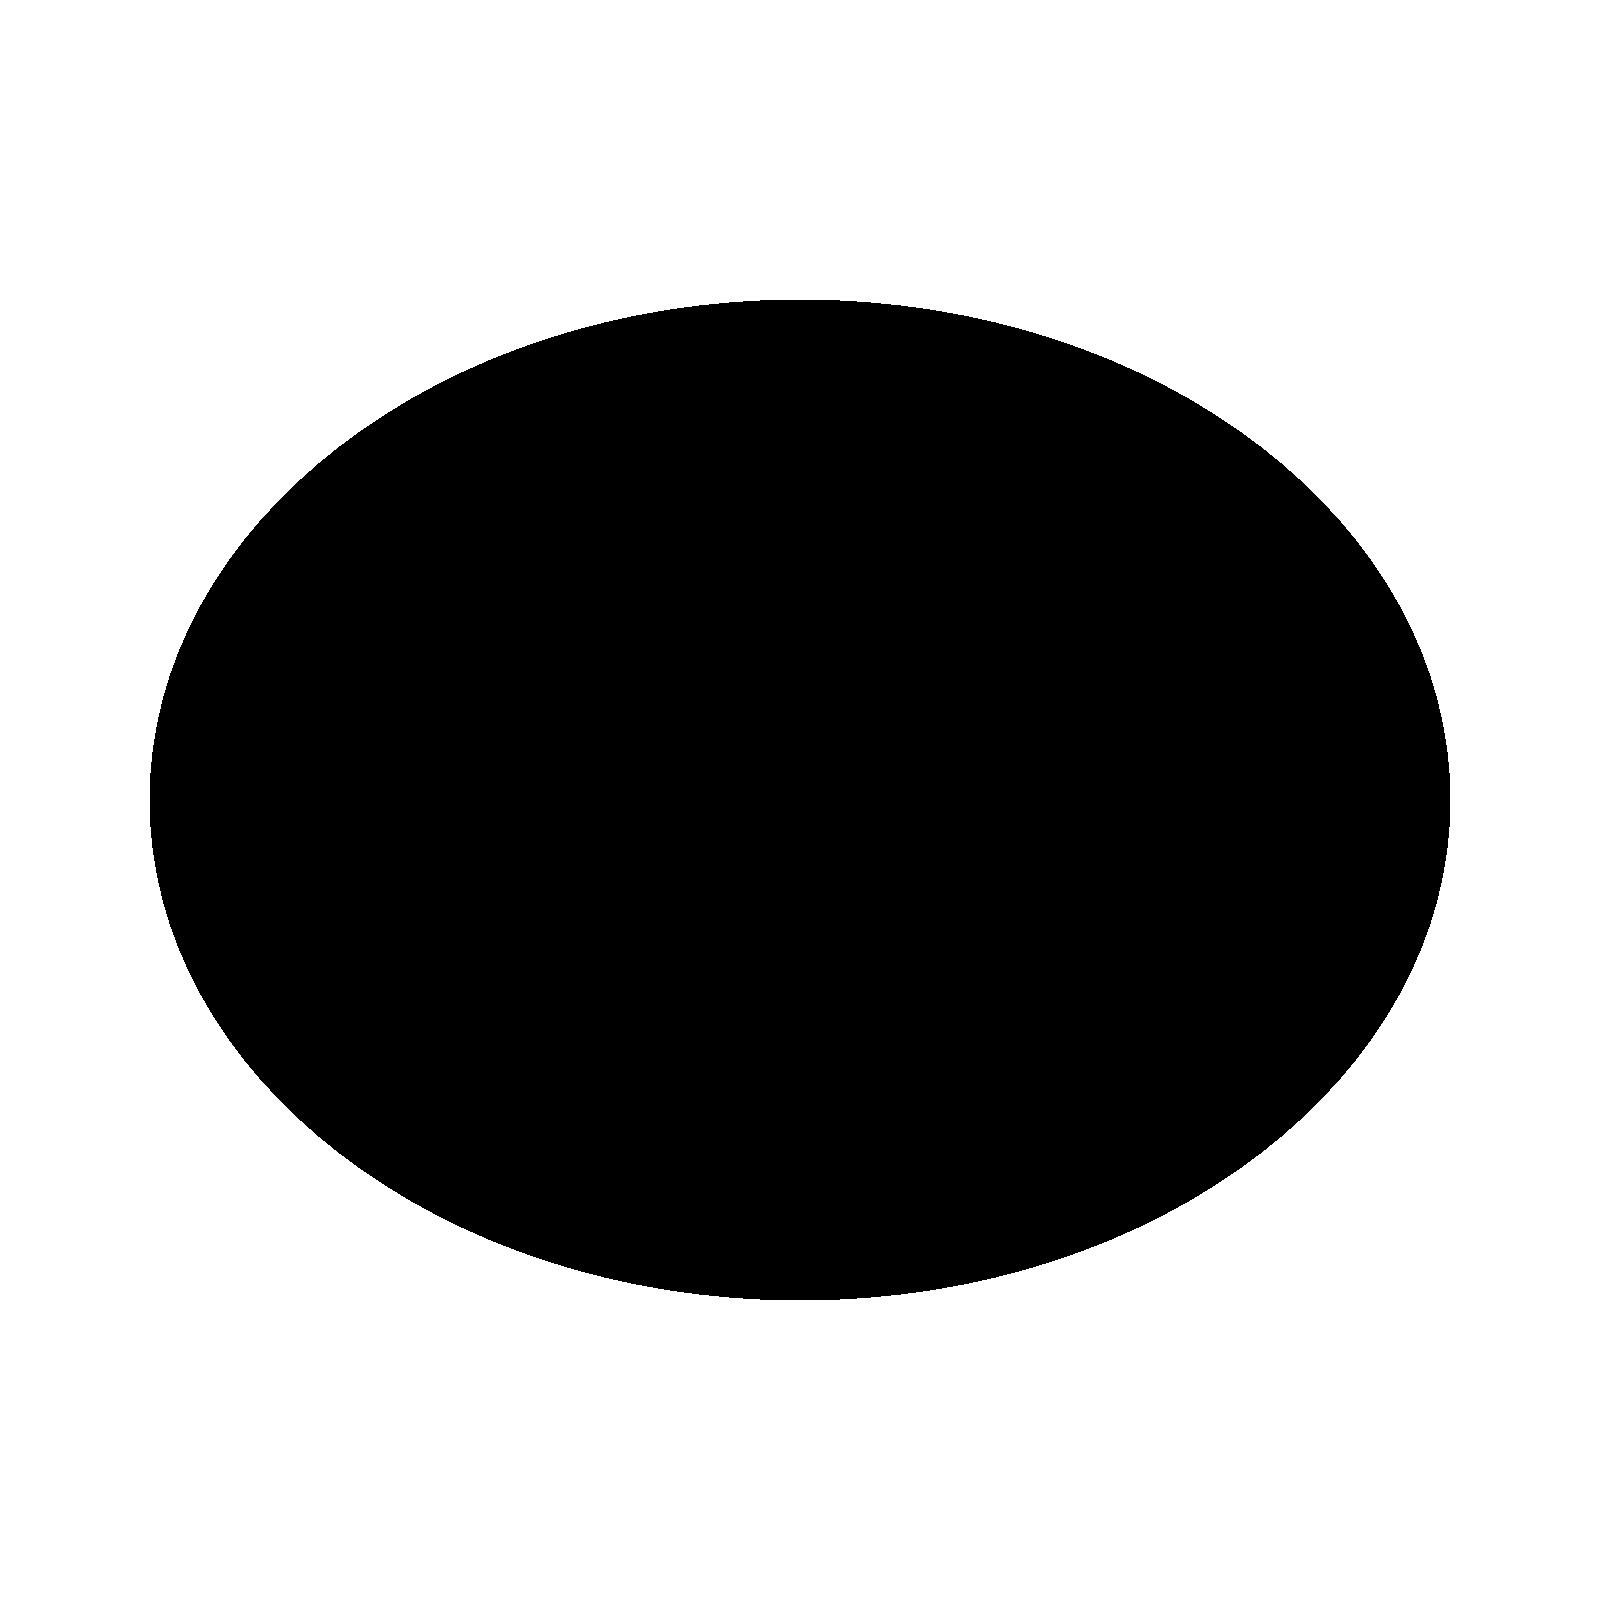 Polka dot clip art. Oval clipart ellipse